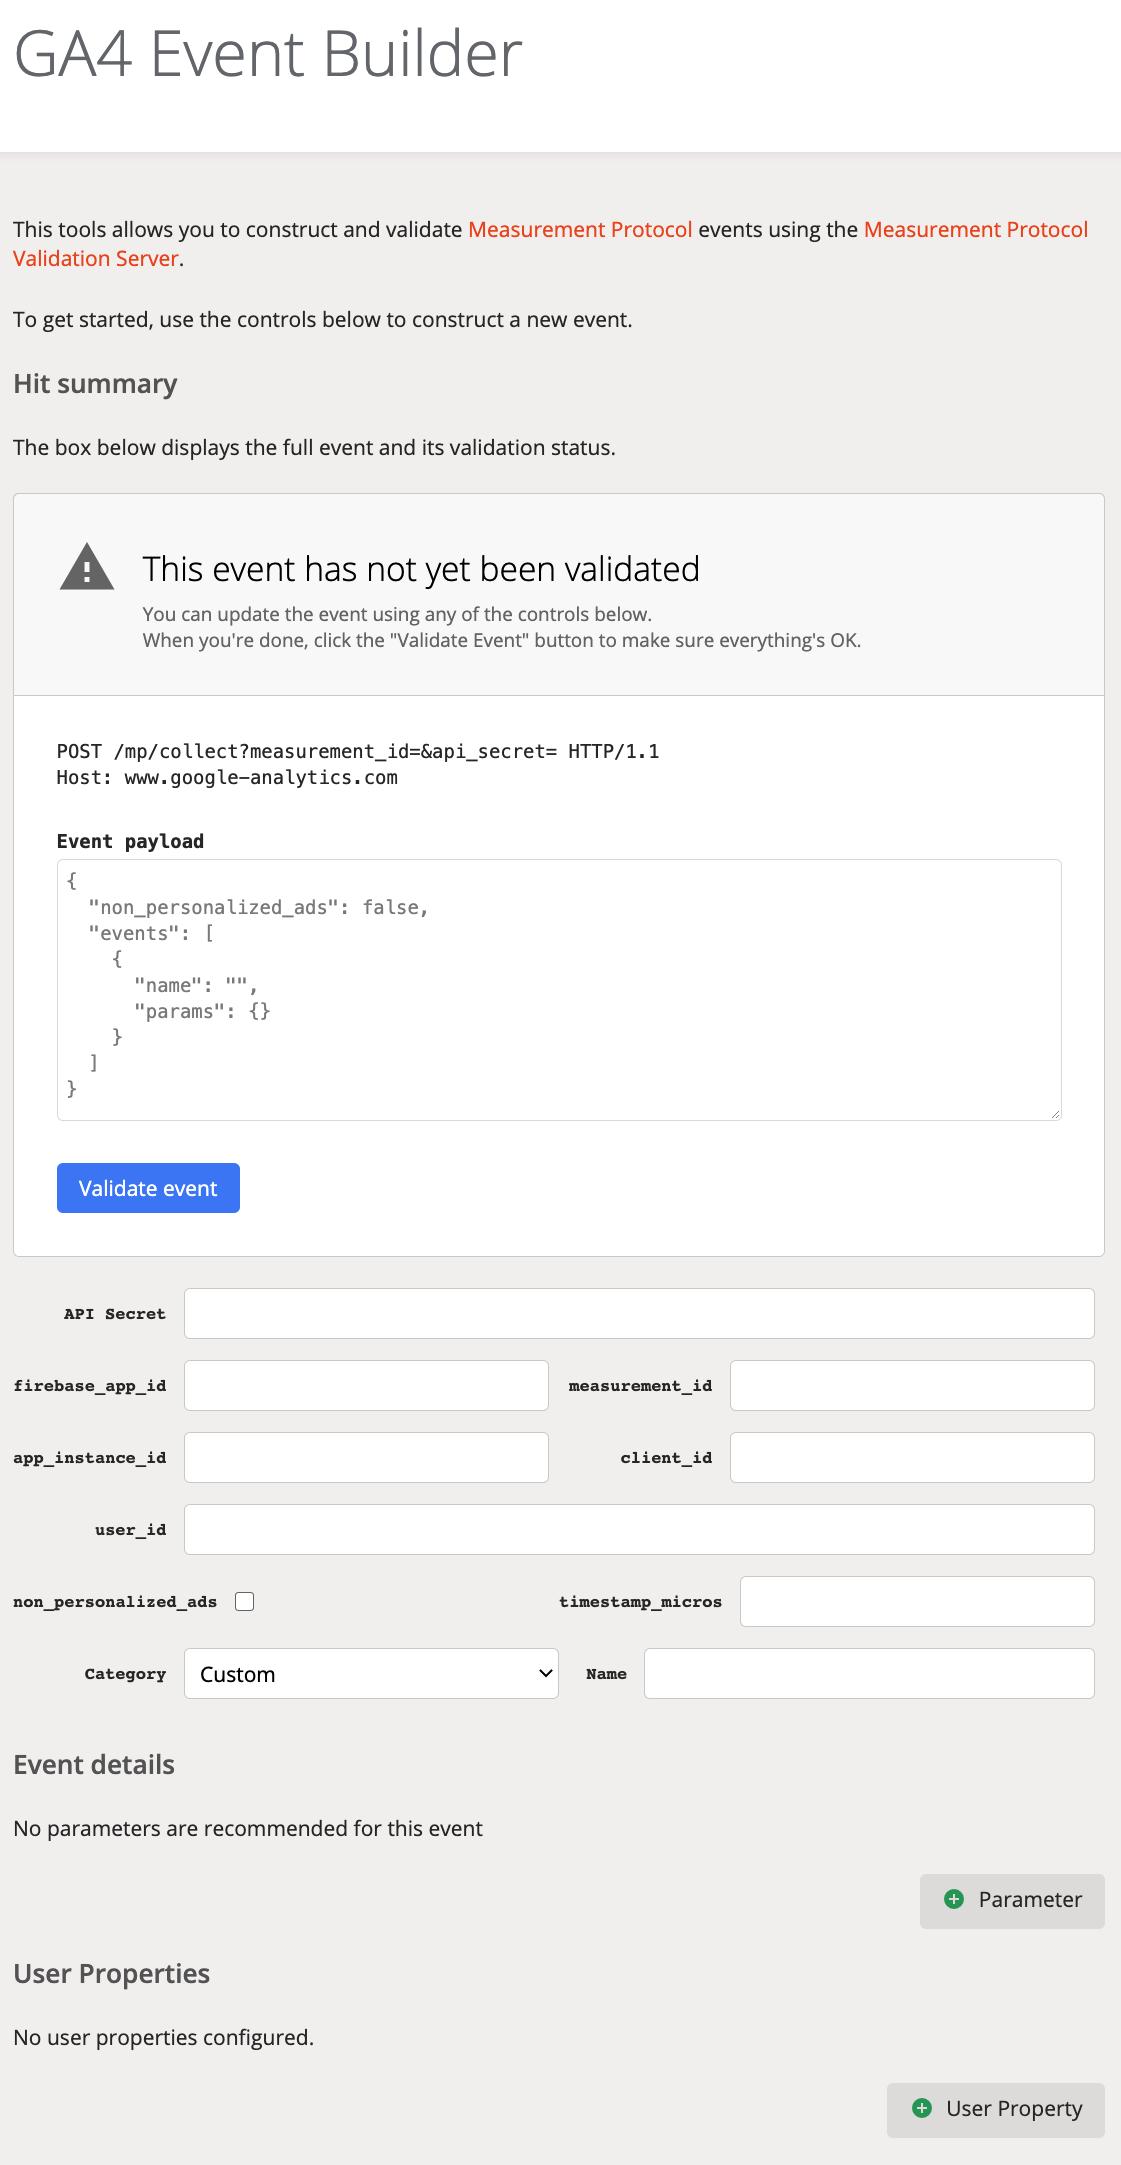 GA4 event builder